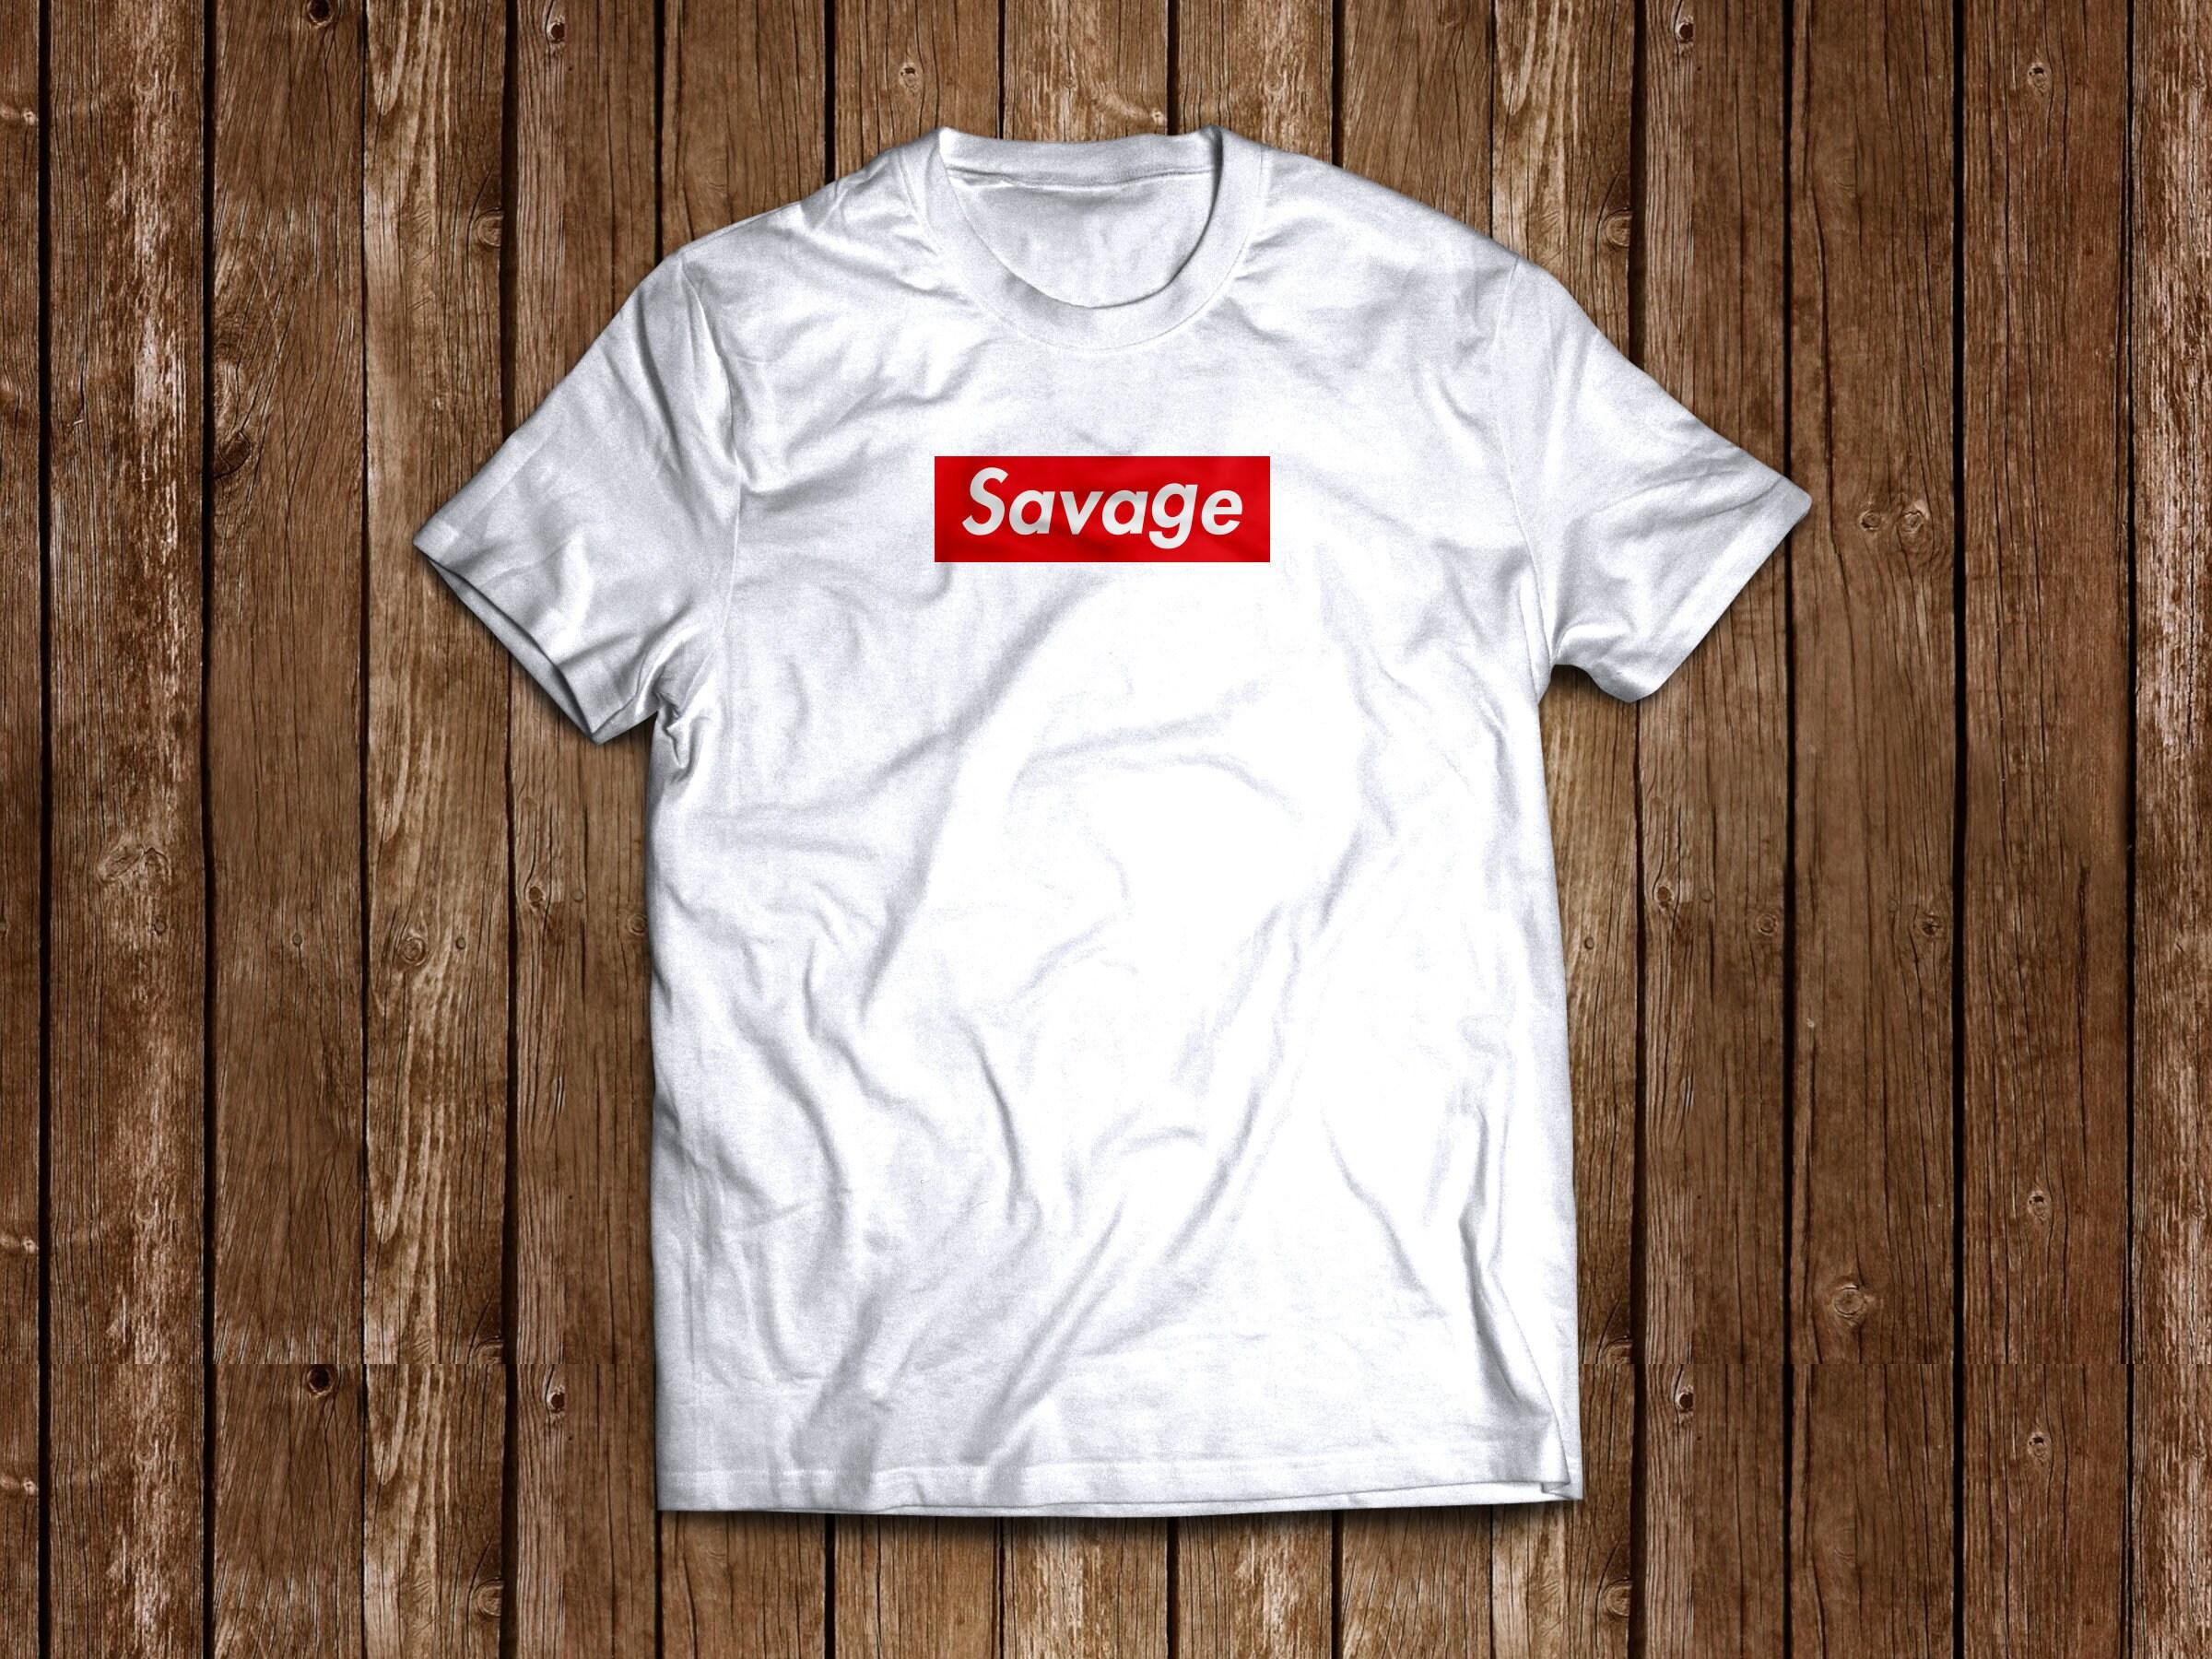 1cd1da52c9eb87 21 SAVAGE custom supreme like box logo shirt tee White Gray